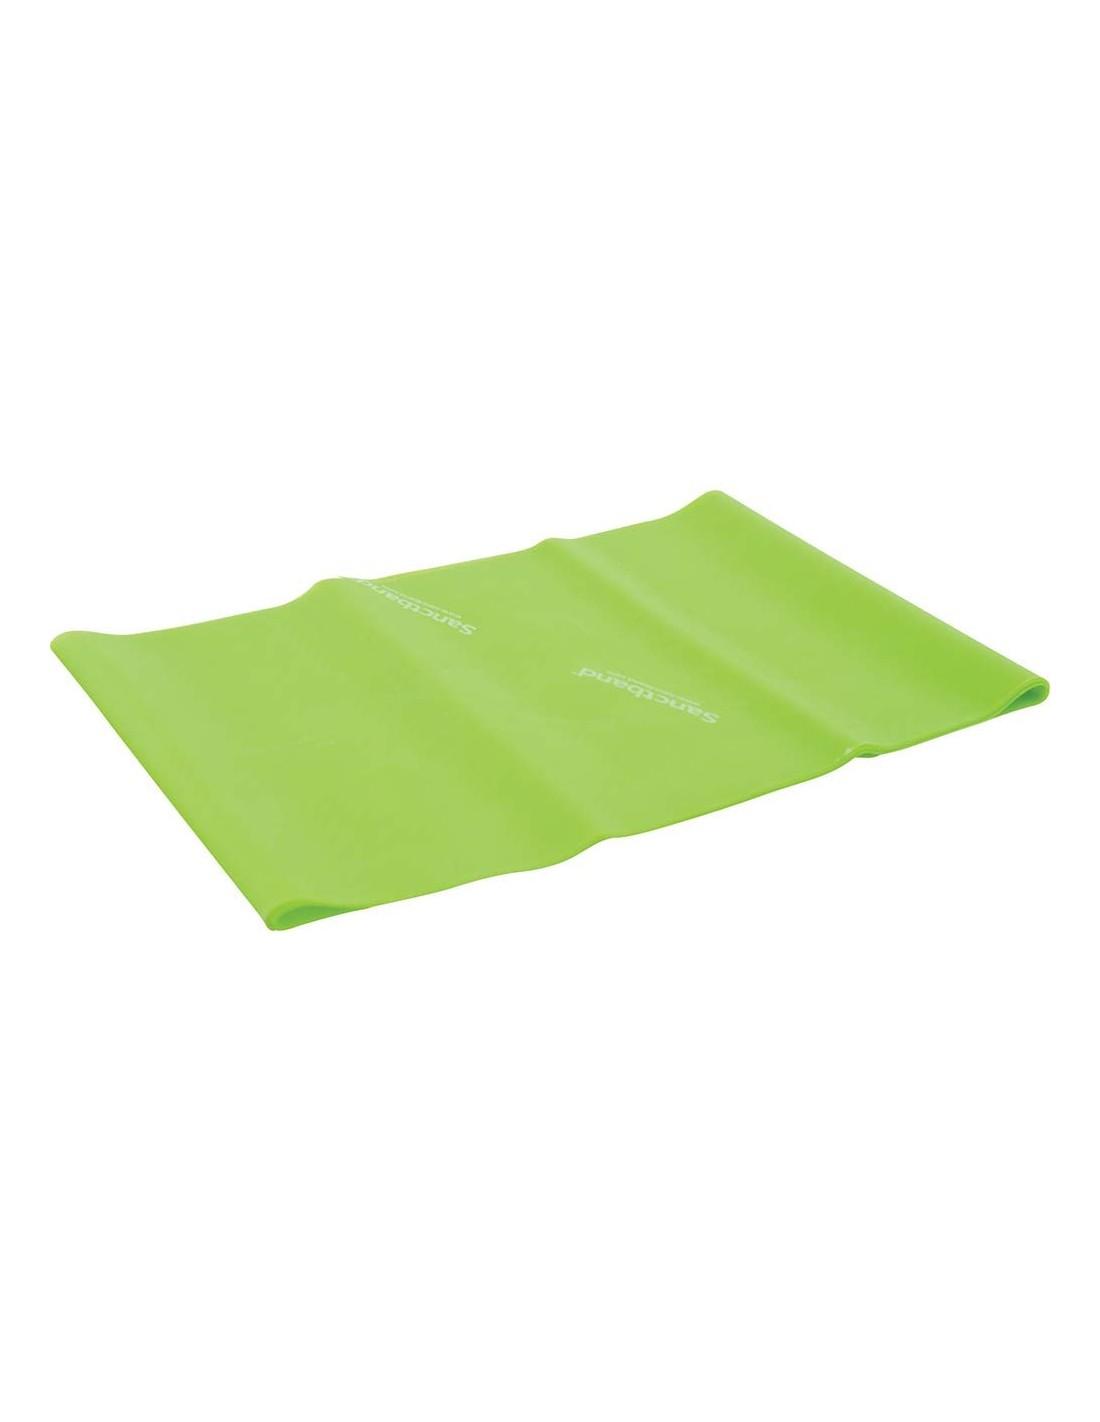 617f99a995 Τσάντα πλάτης anti-theft τρία χρώματα - taftaf.gr